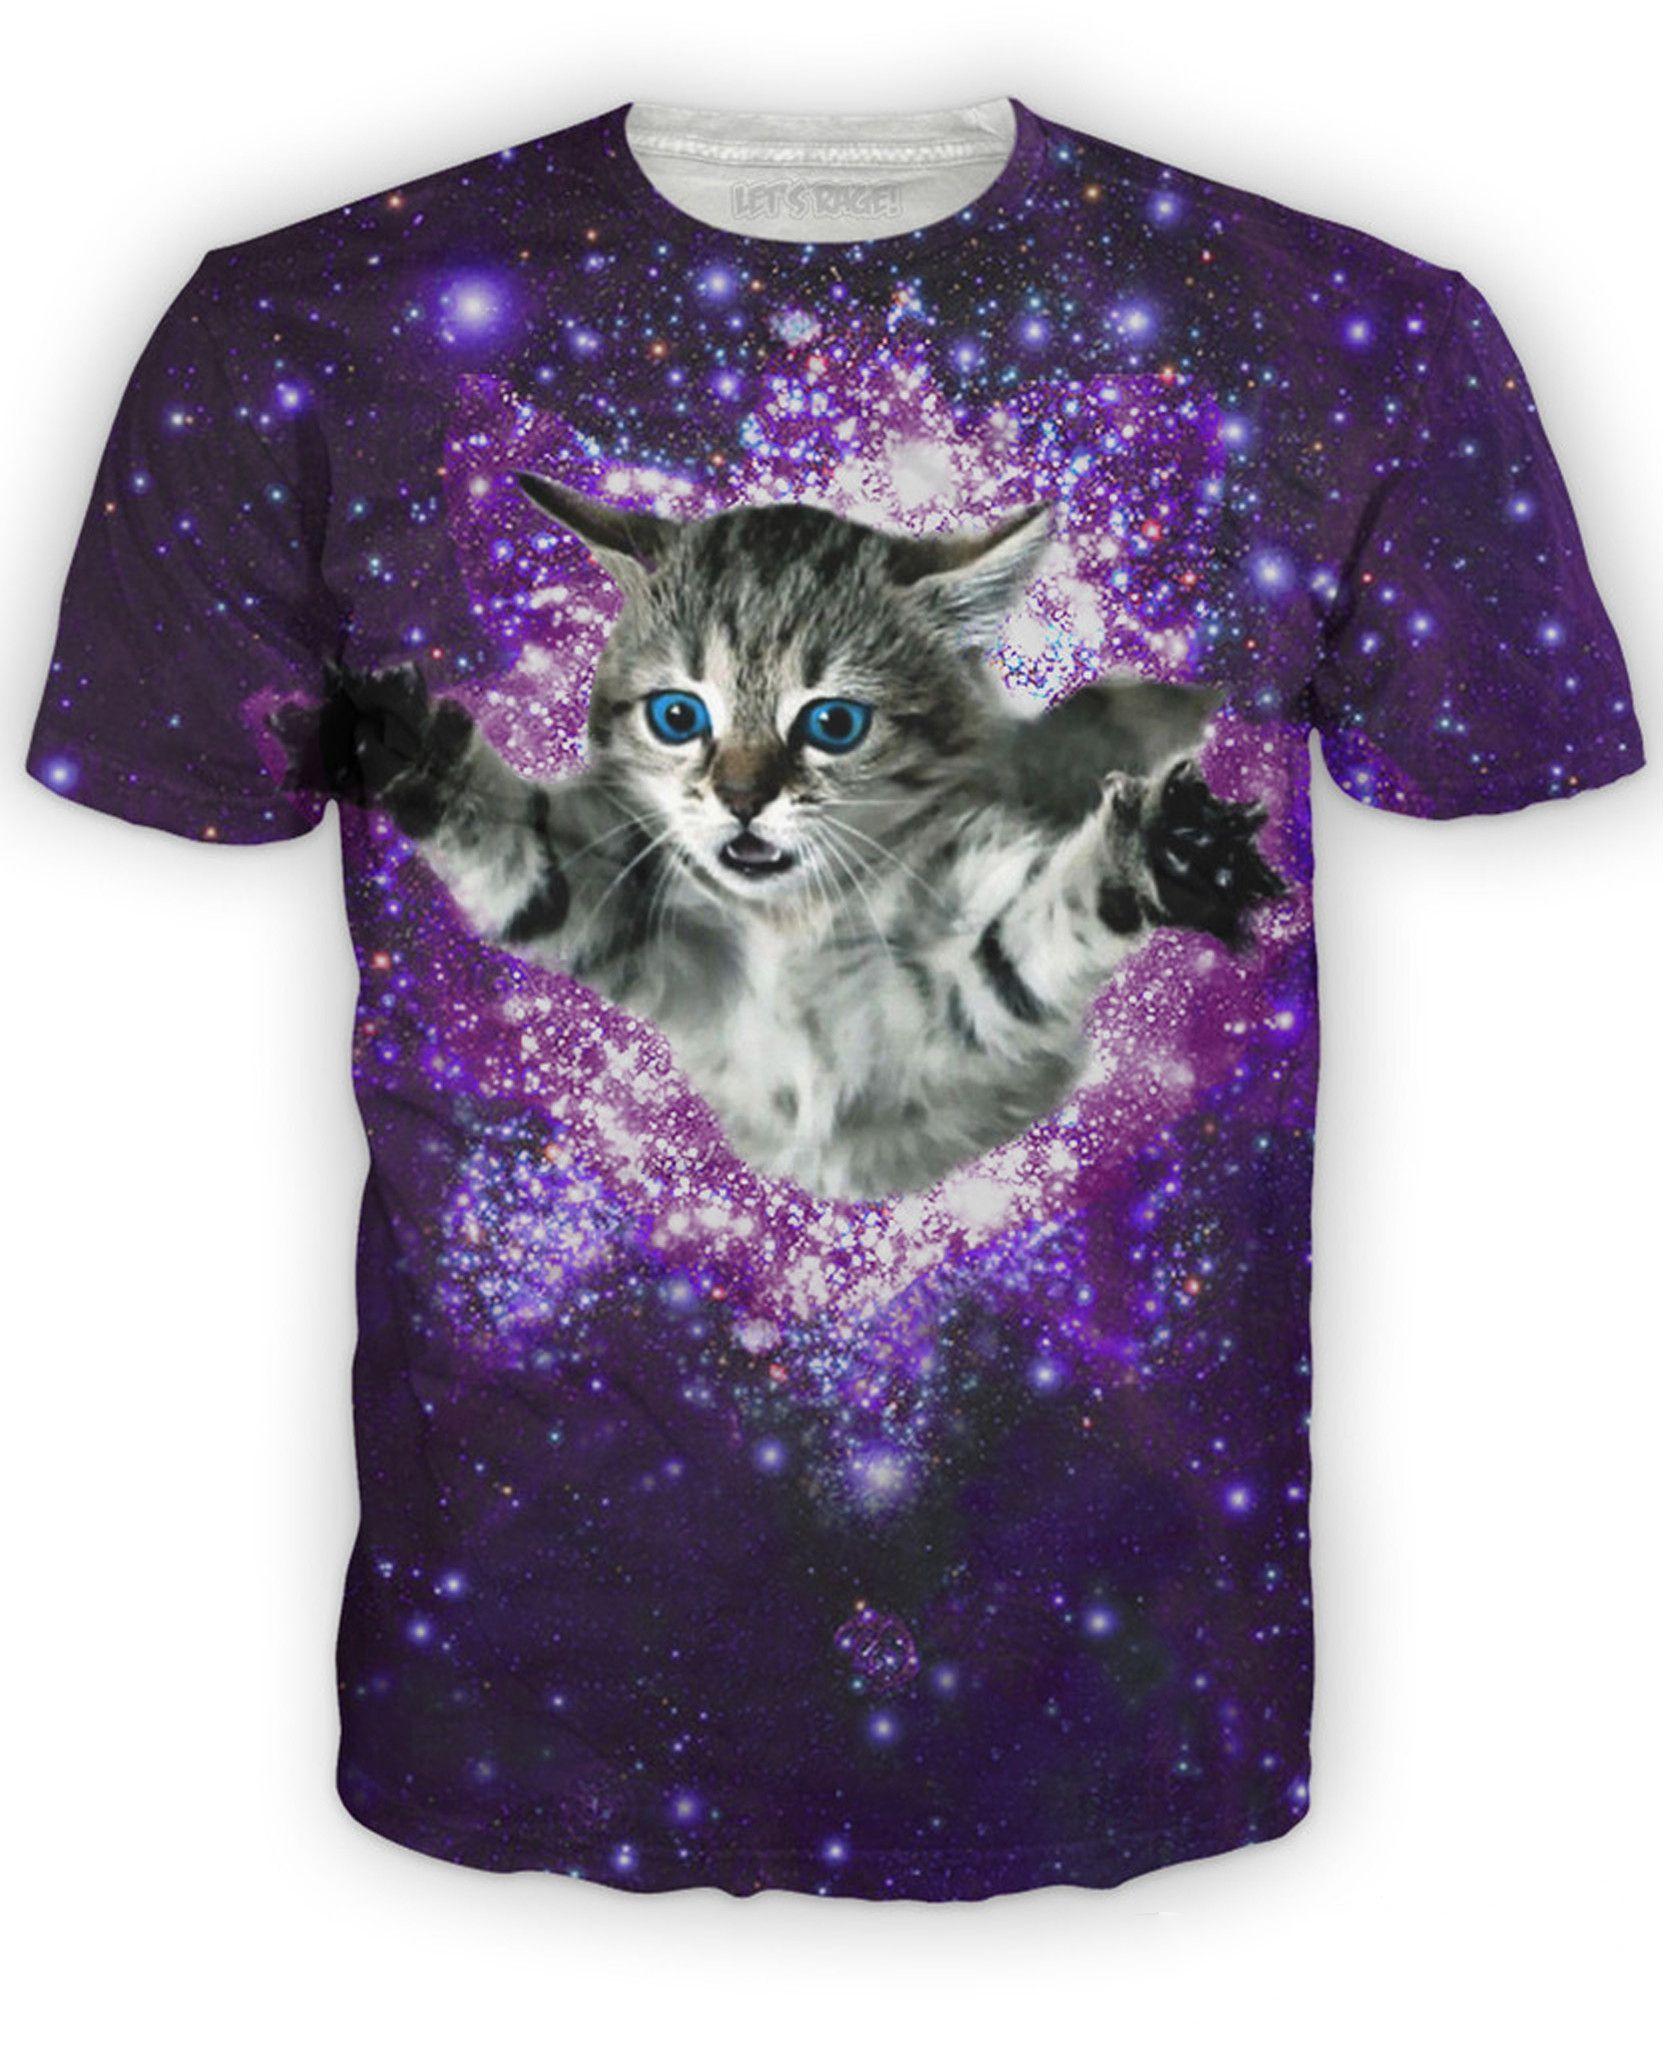 Kitty Glitter T Shirt Summer Tee Shirts Funny Outfits Animal Tshirt